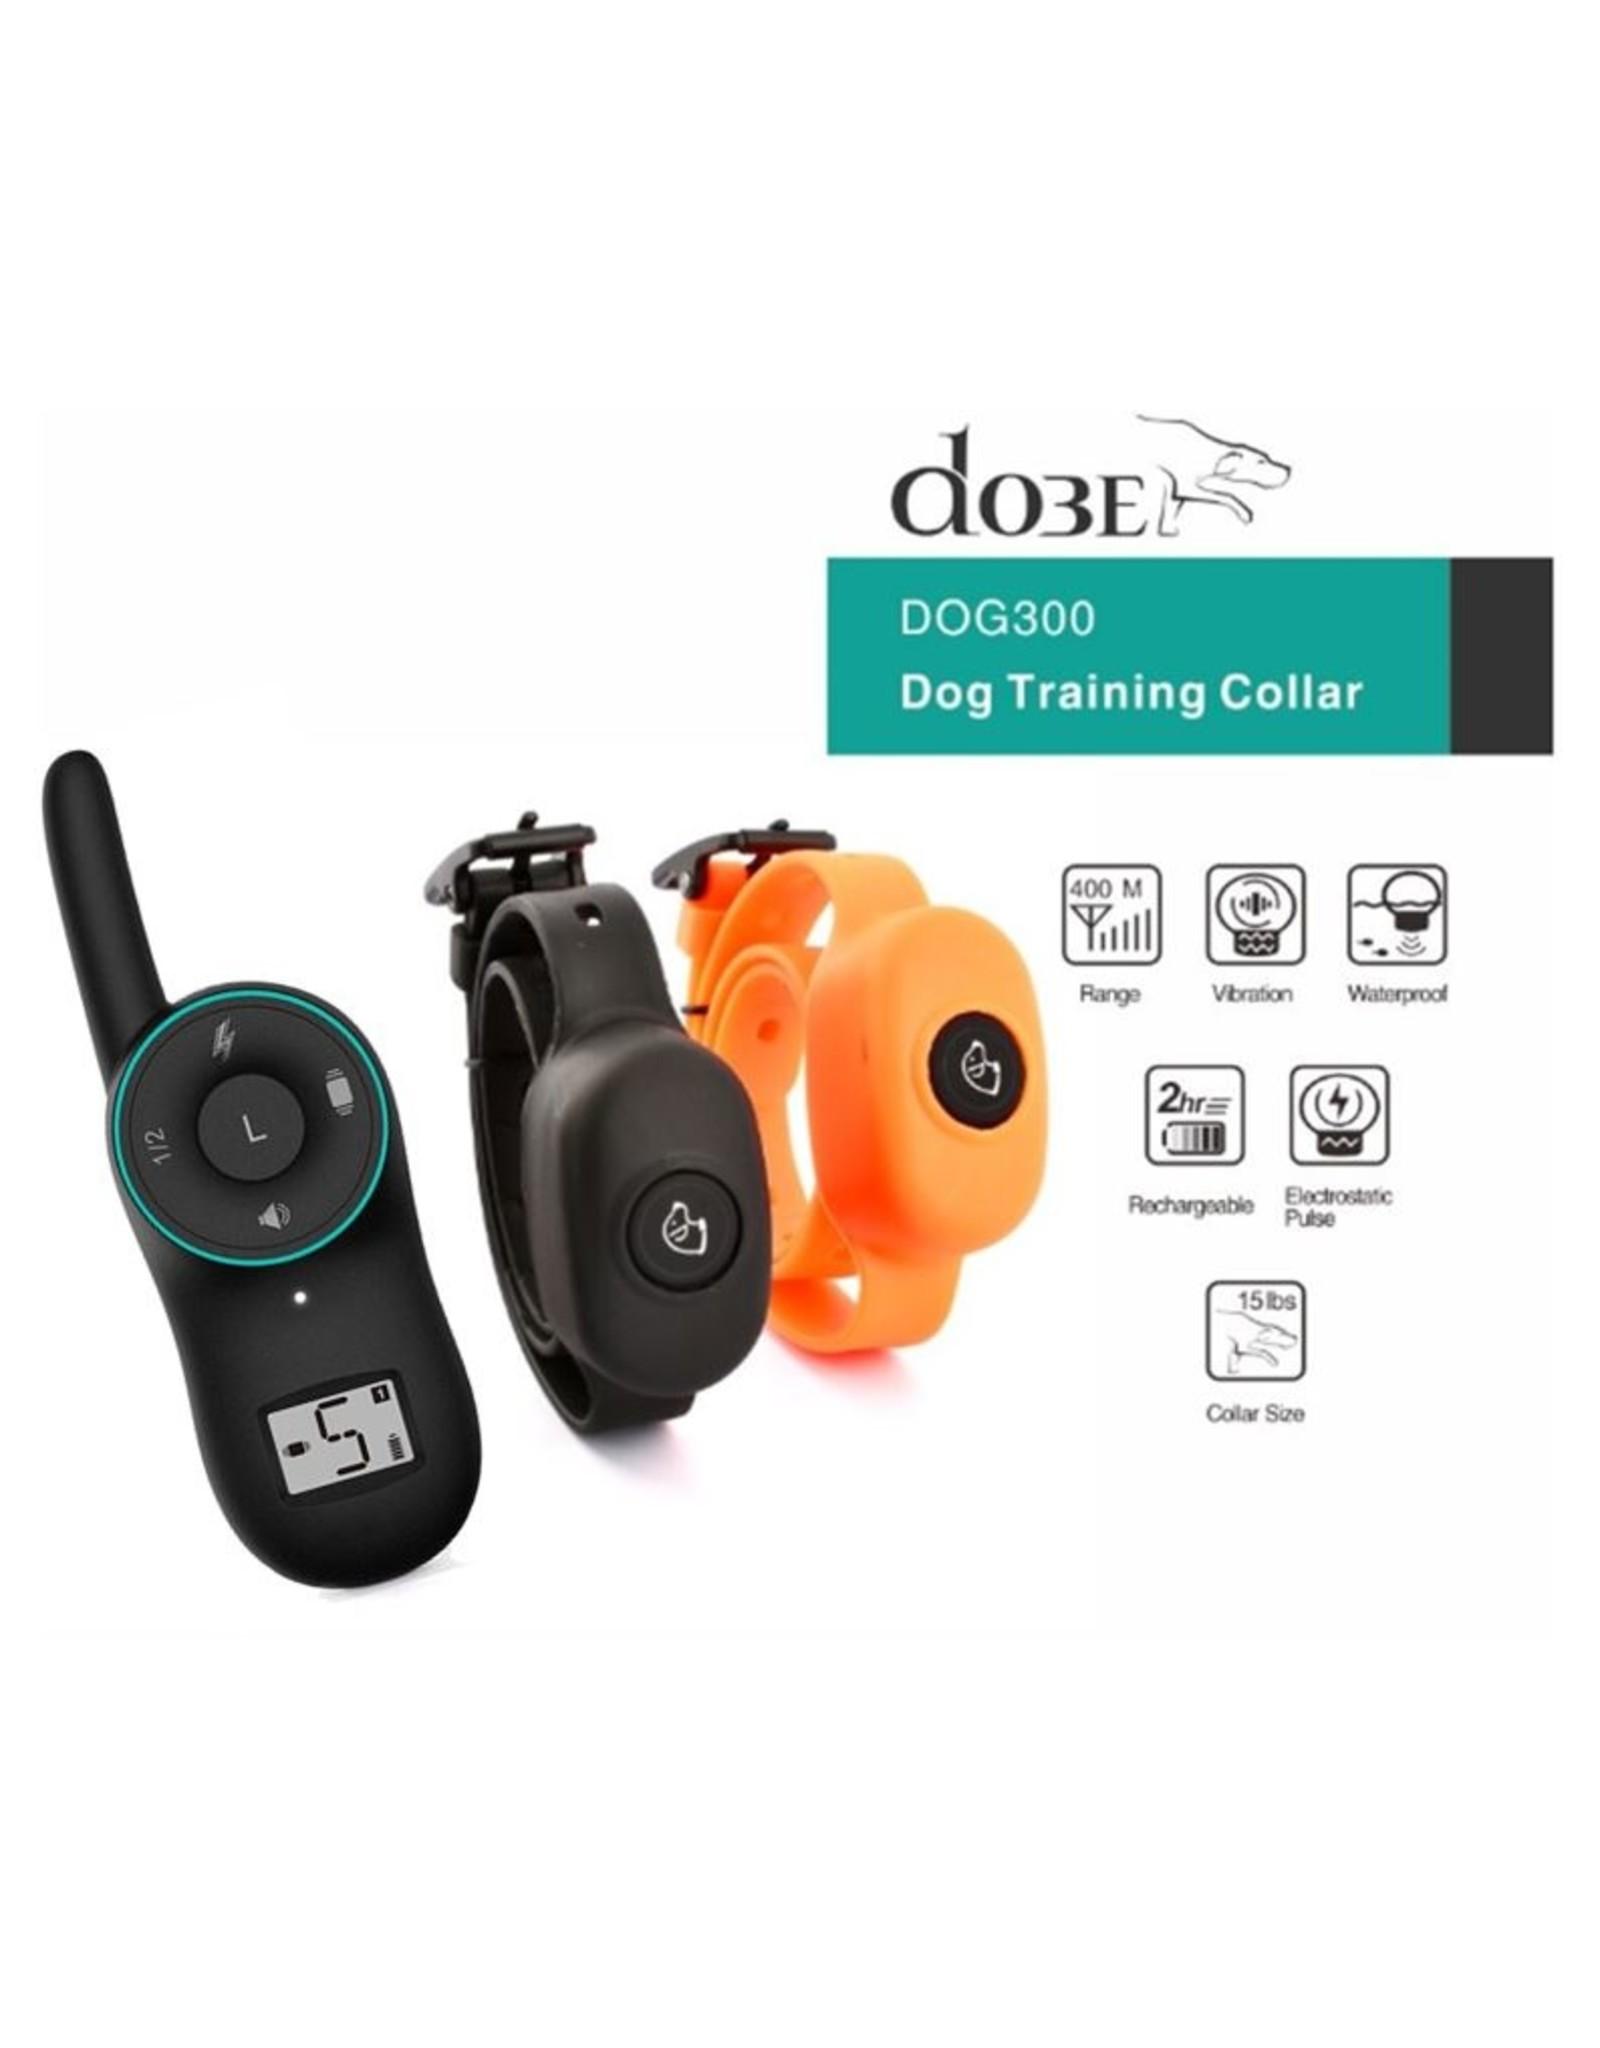 Trainingshalsband - trainingsband voor u hond met afstandsbediening - Waterdicht - Oplaadbaar - Voor 2 honden